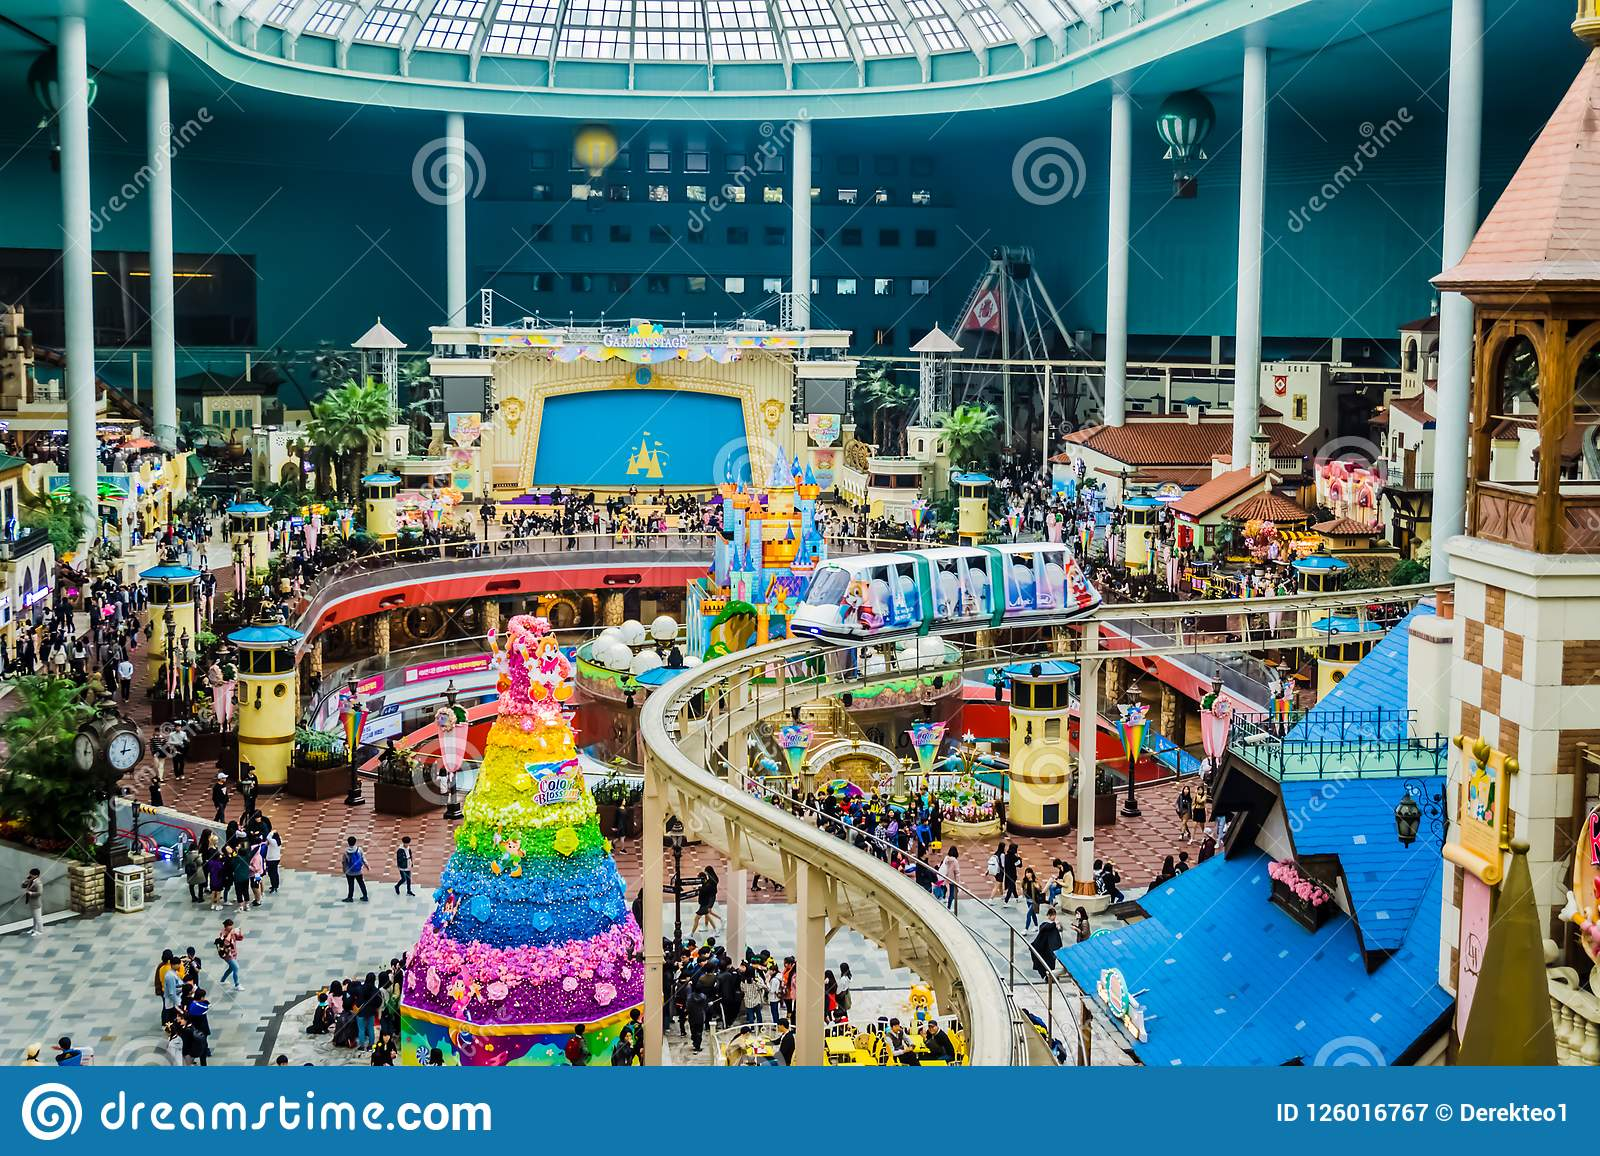 World Monorail In Lotte World Adventure Theme Park Editorial